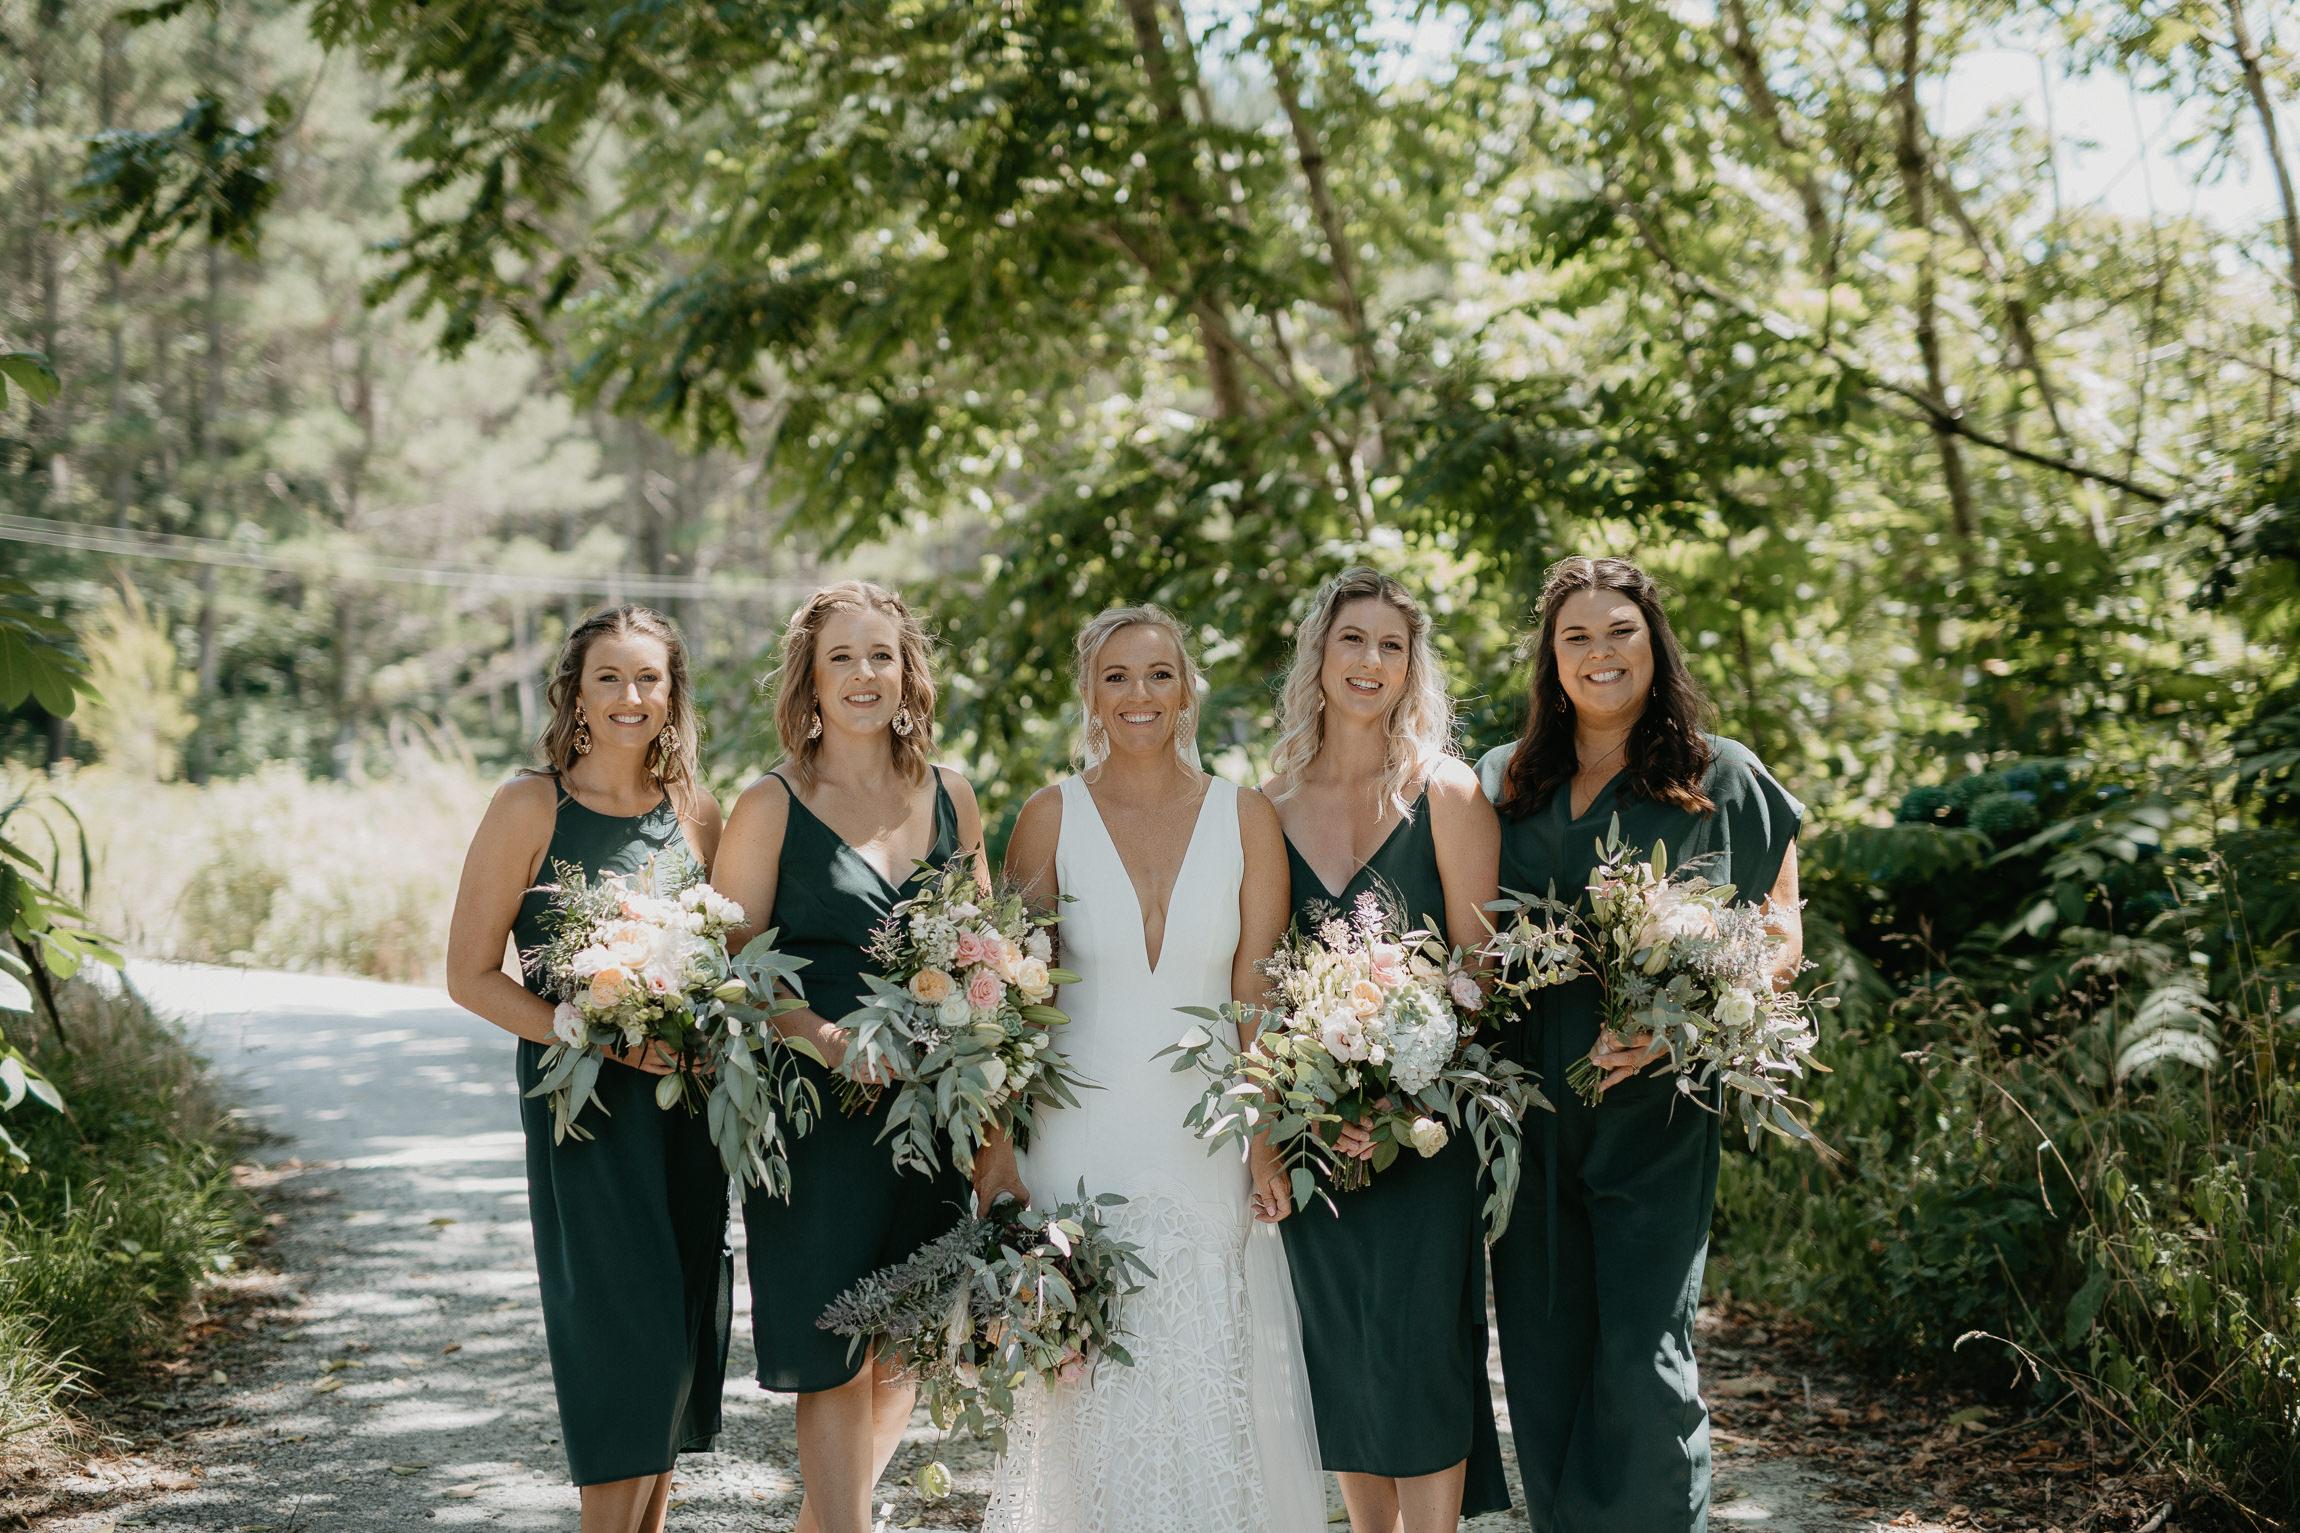 oldforestschool-wedding-blog-75.jpg